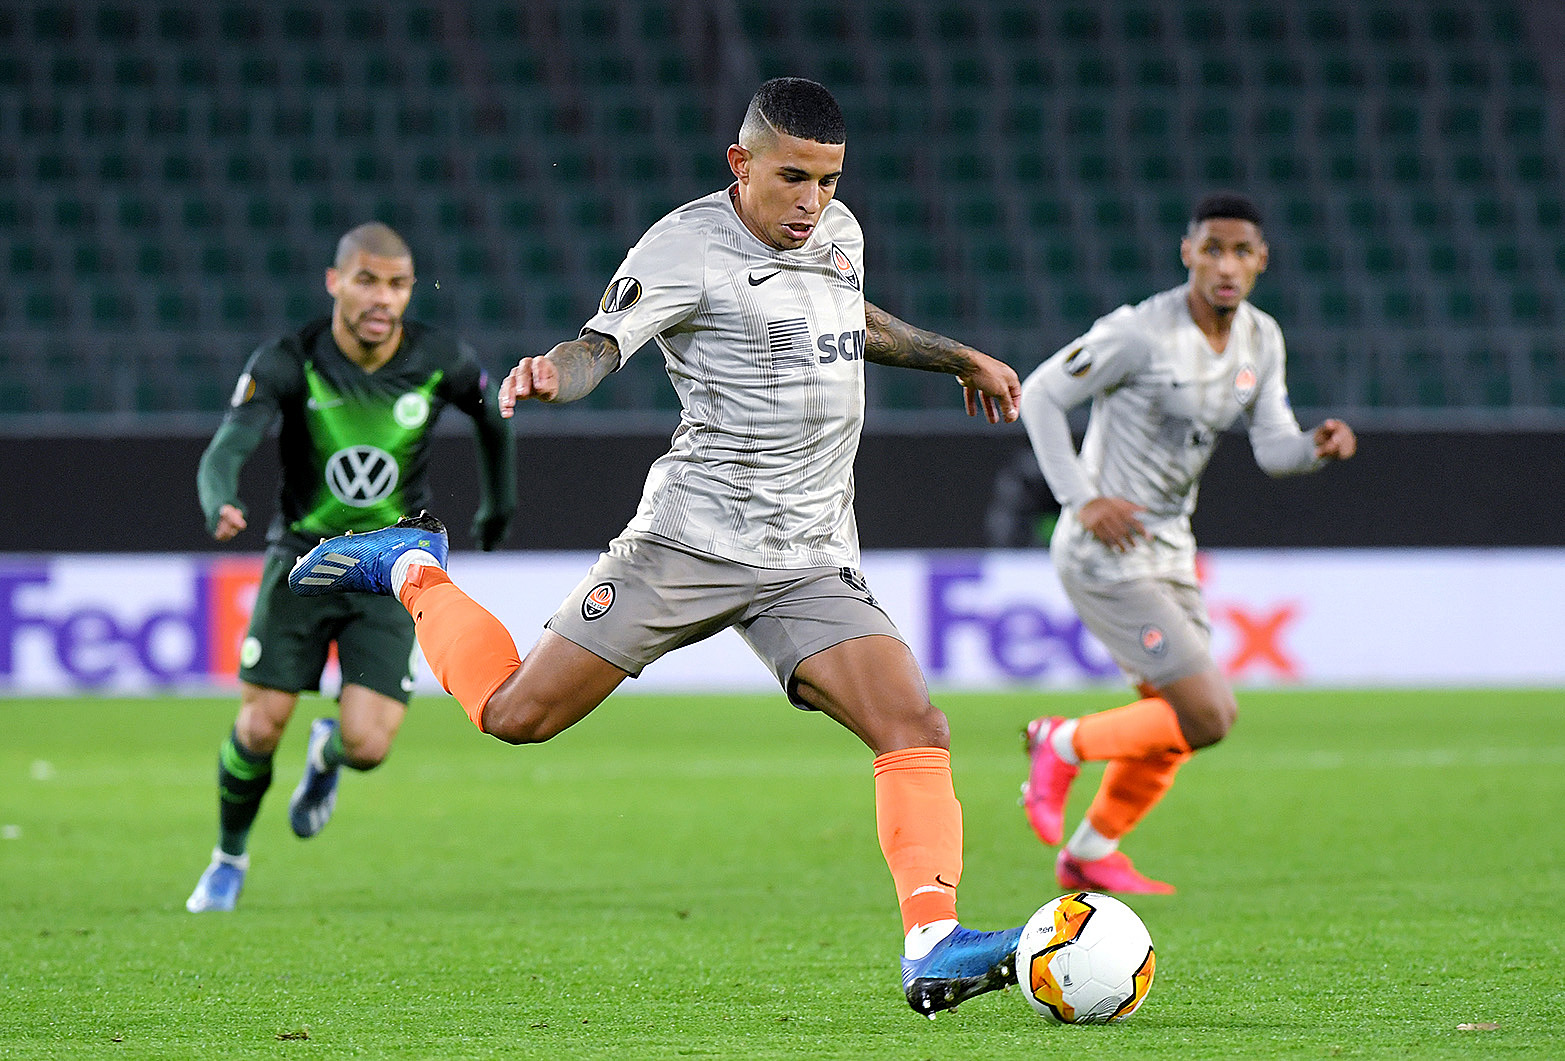 Inter Milan vs Shakhtar Donetsk – Showdown in Düsseldorf